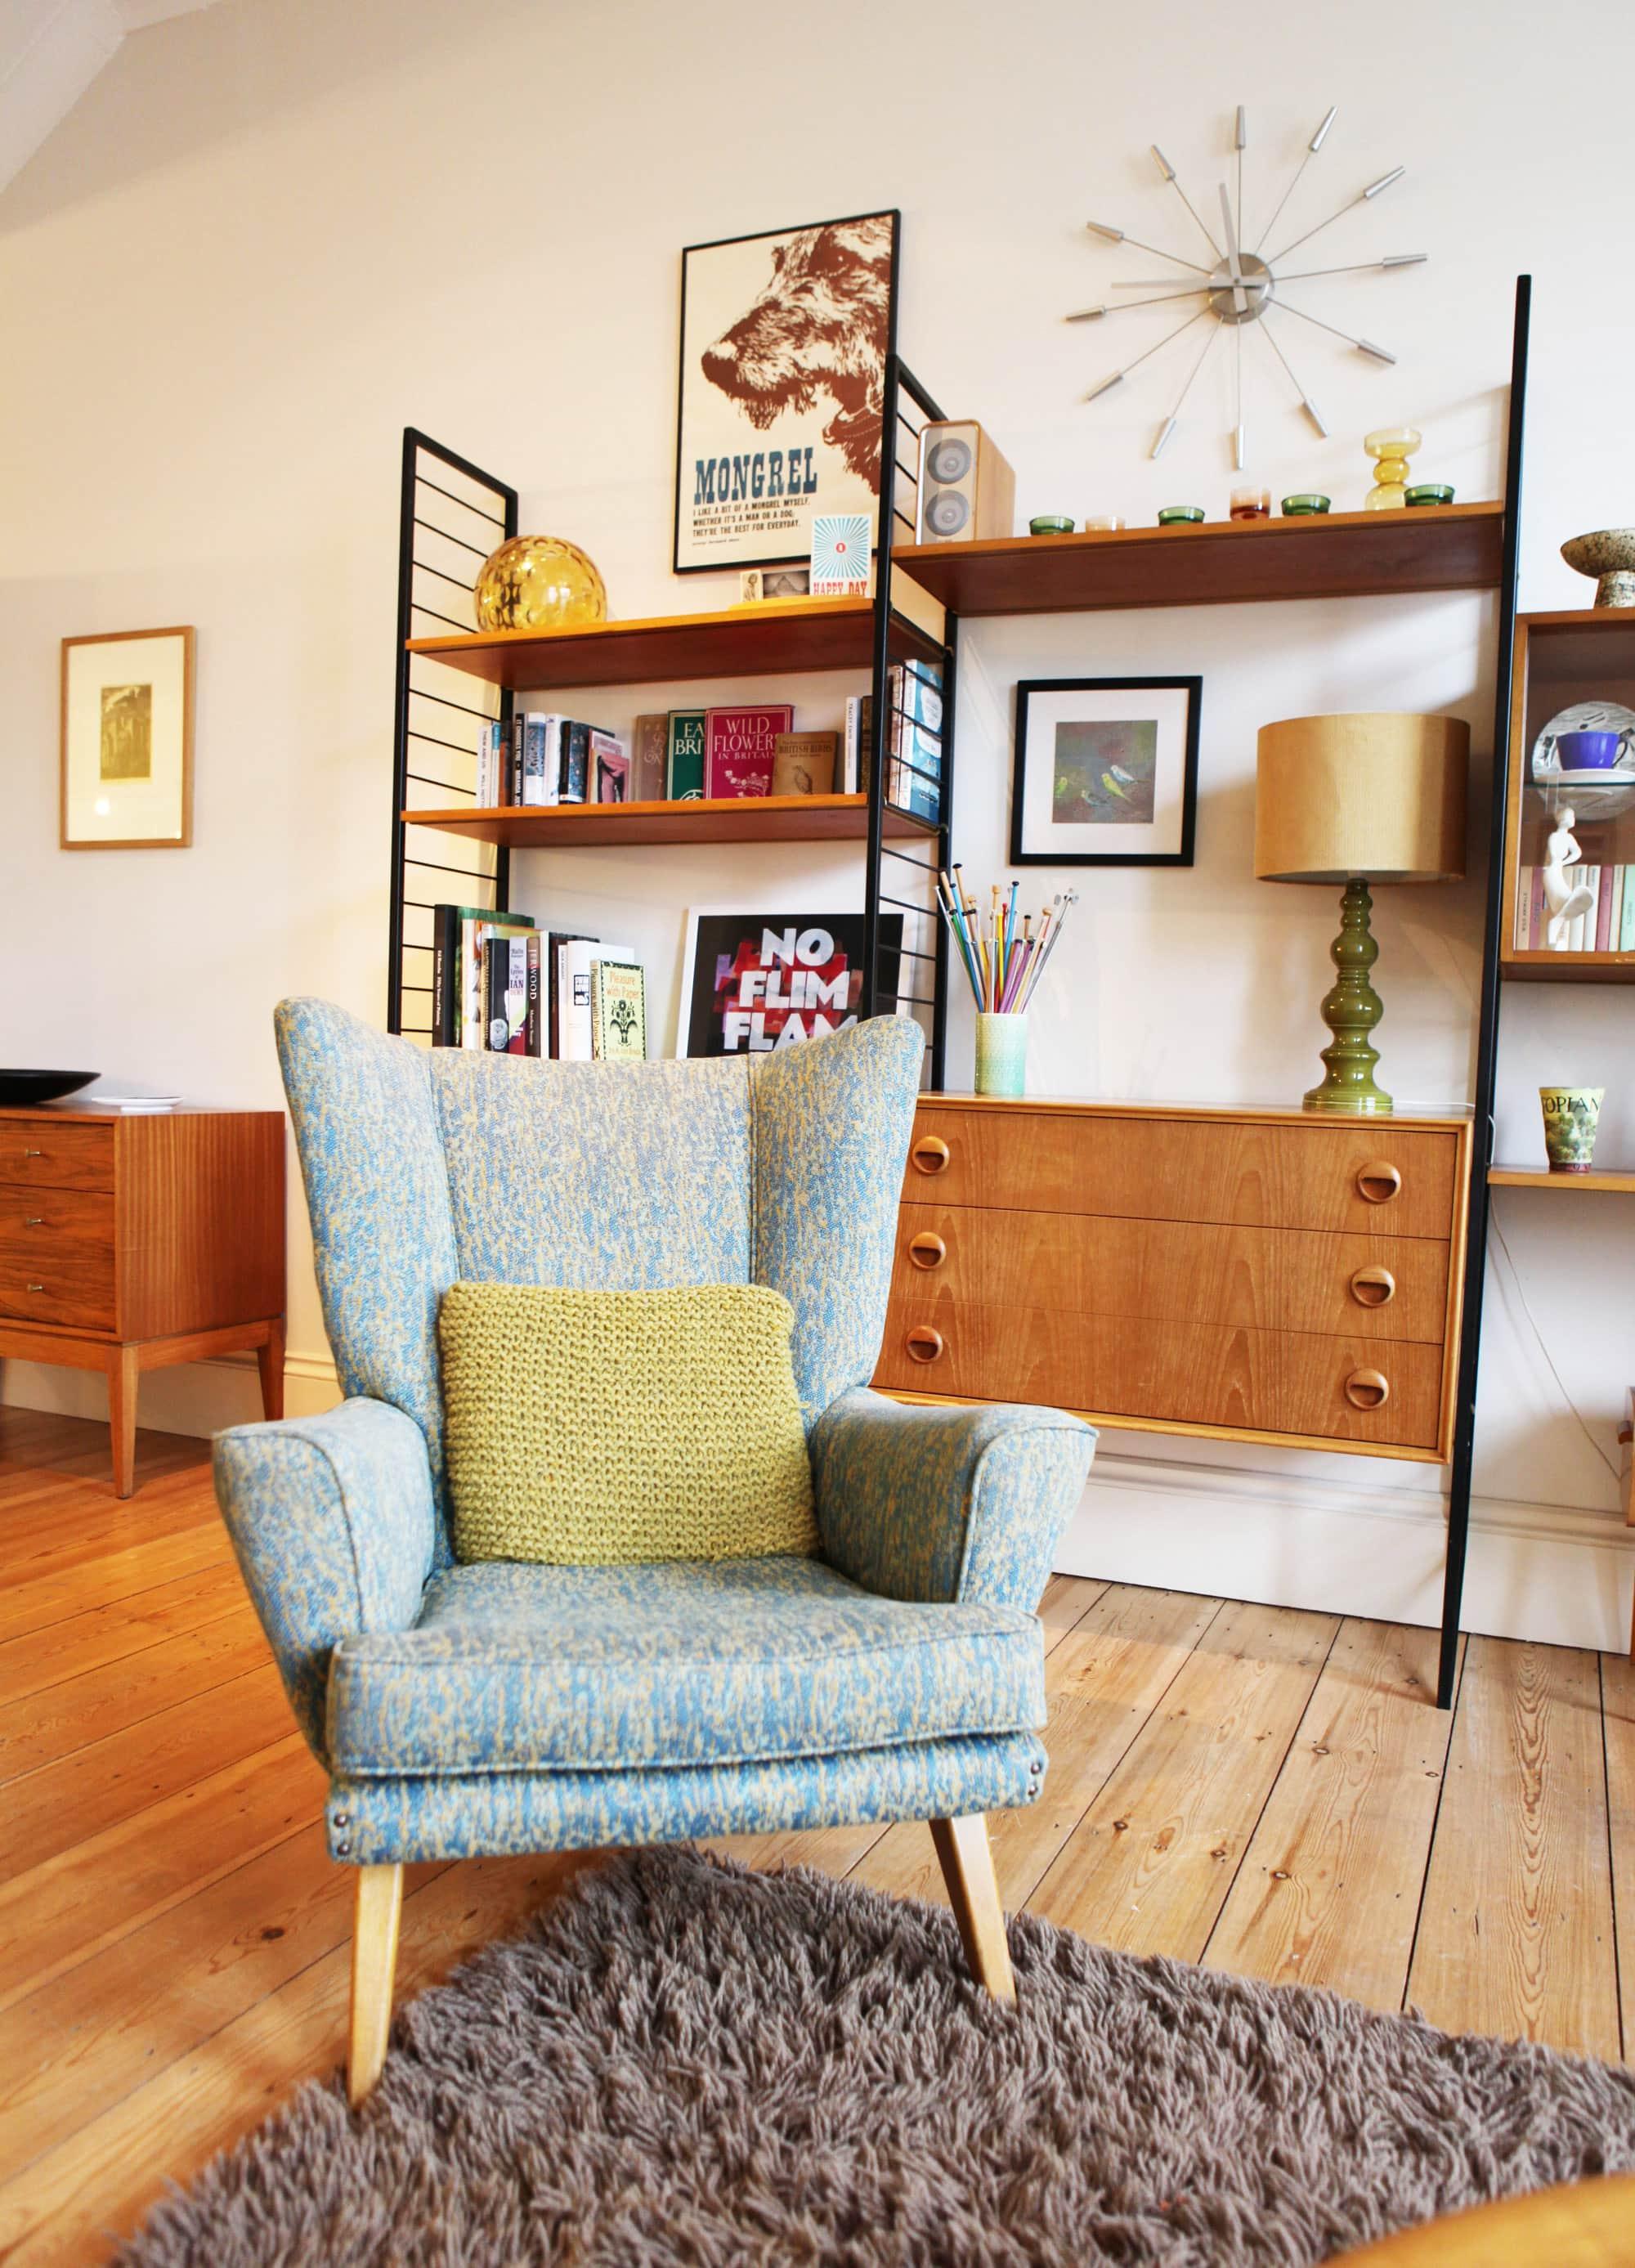 Lesley's Cozy Cool UK Coastal Home: gallery image 3